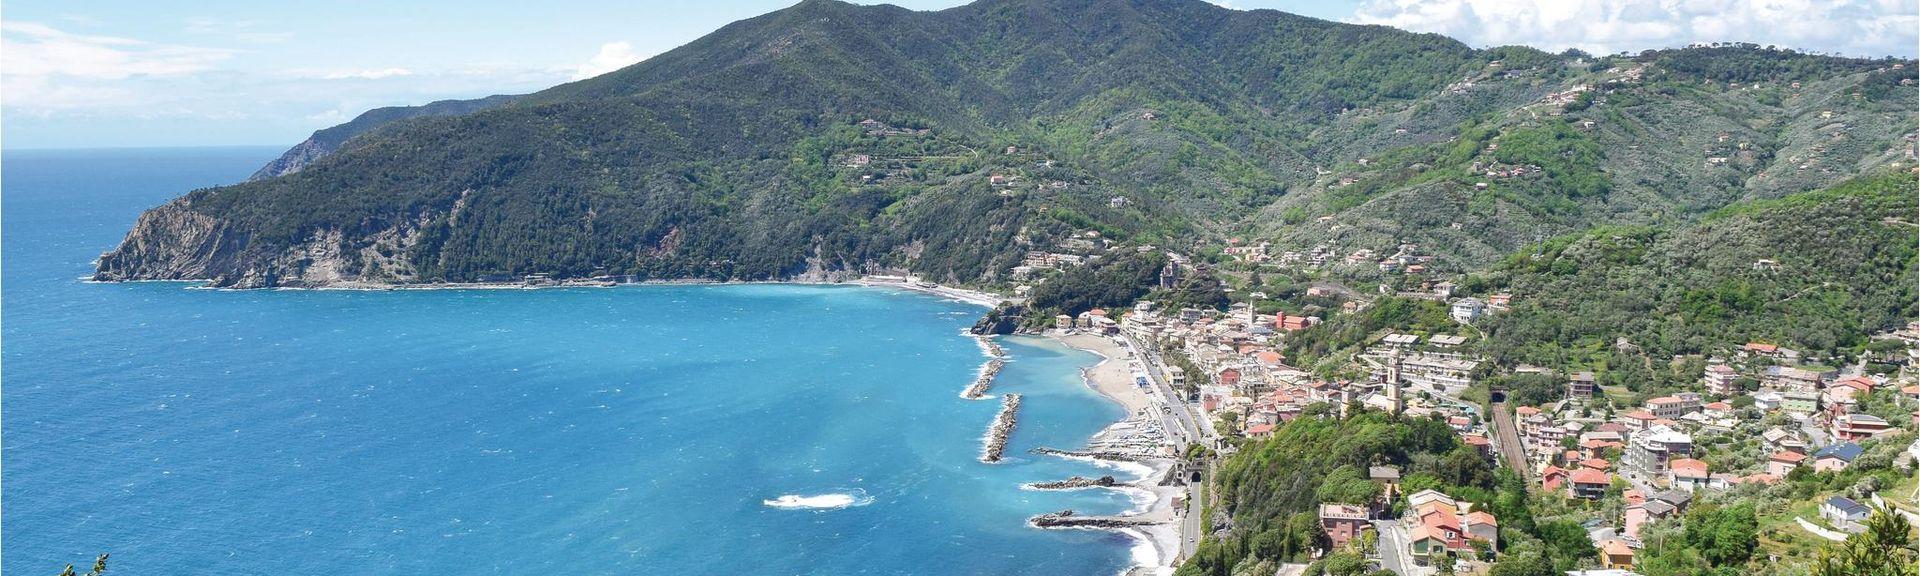 Paraggi, Santa Margherita Ligure, Liguria, Italia